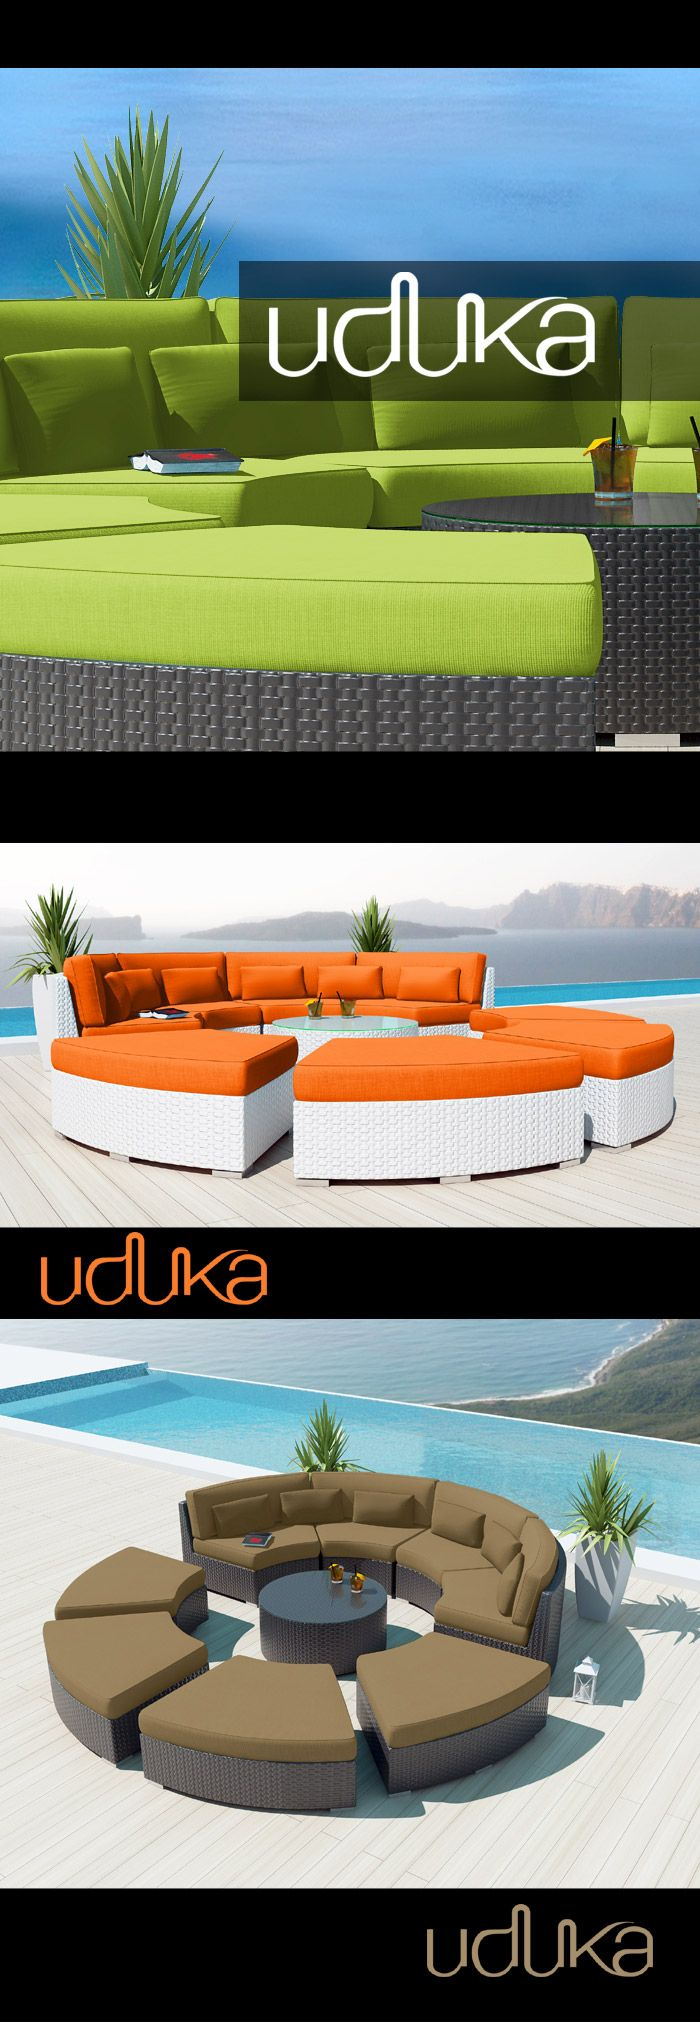 Uduka Outdoor Sectional Modern Patio Furniture White Wicker Sofa Set Porto 6 Orange All Weather Couch #patiofurniture #Wickerfurniture #Rattanfurniture #outdoor